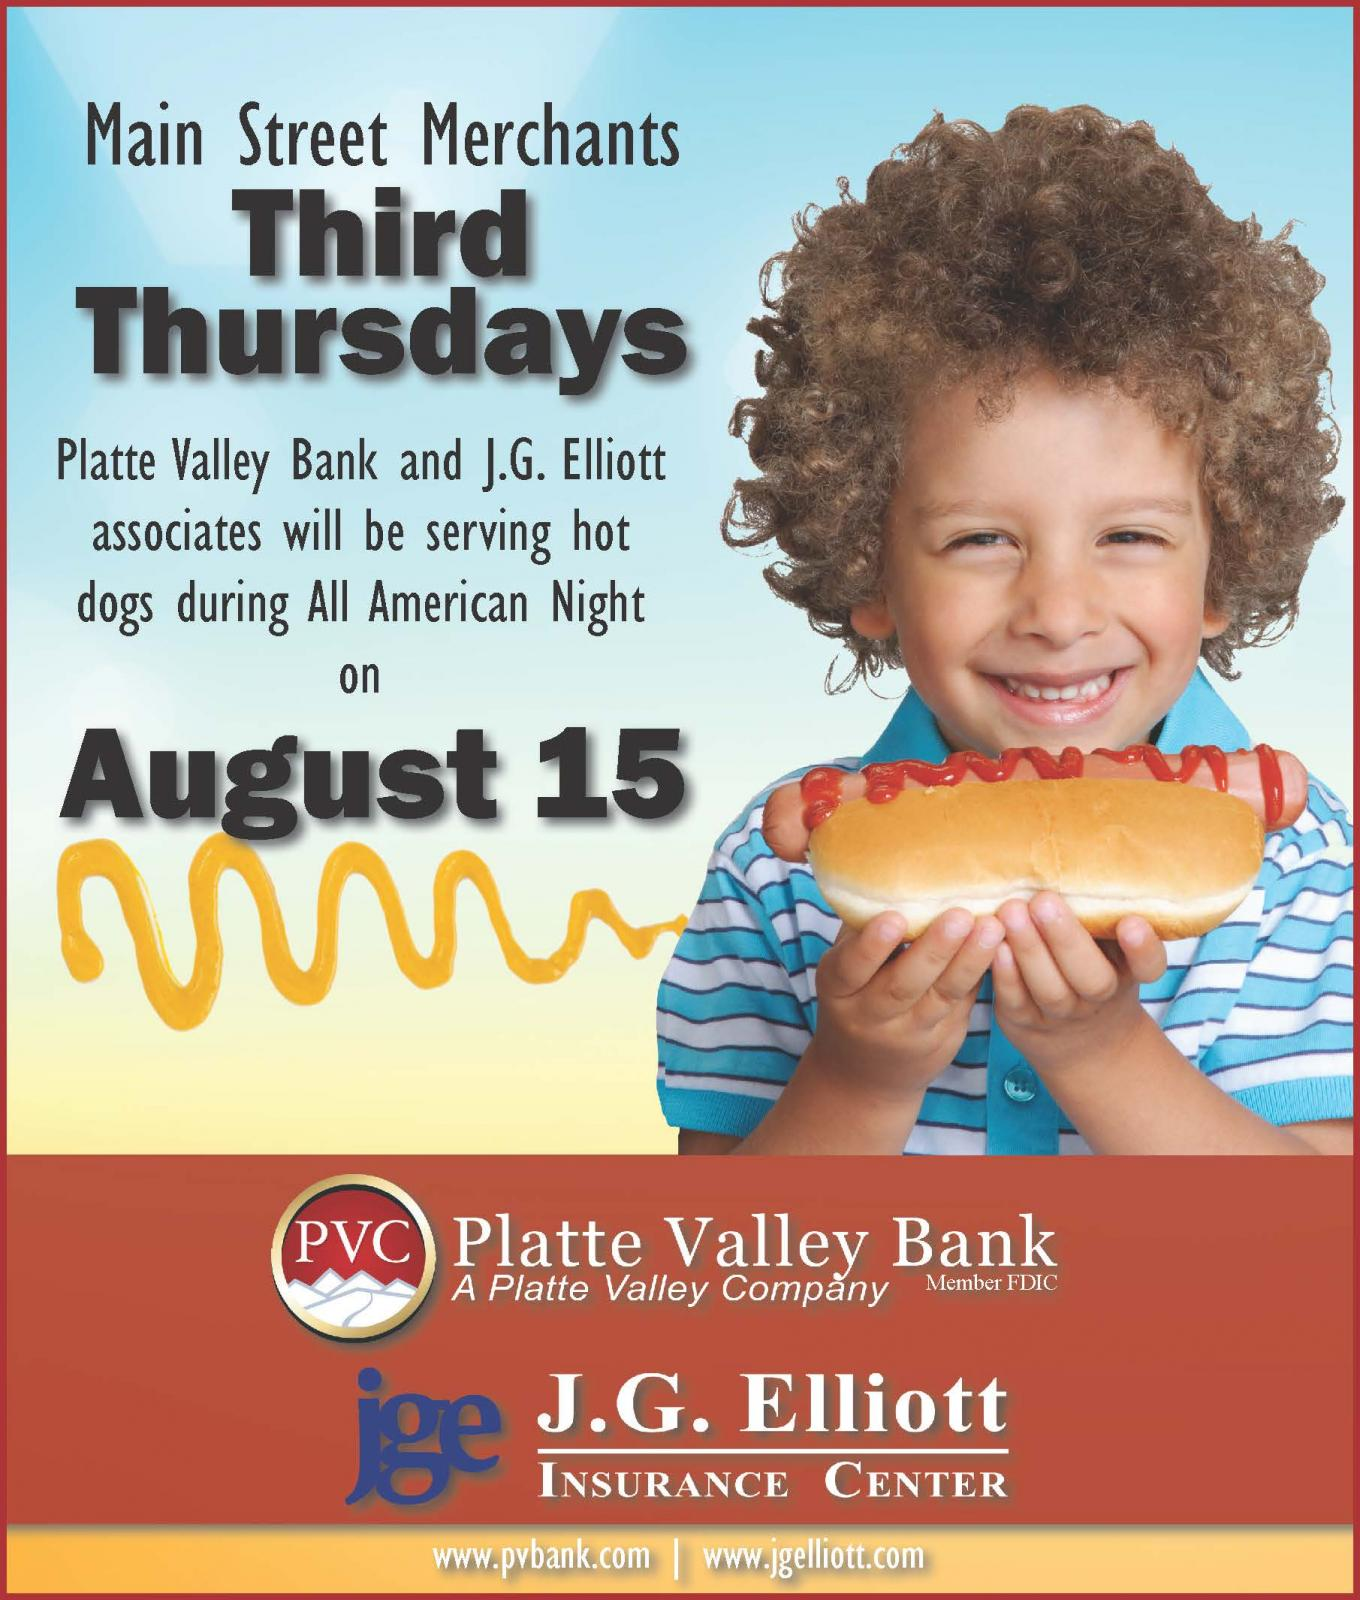 Third Thursday Hot Dogs Photo